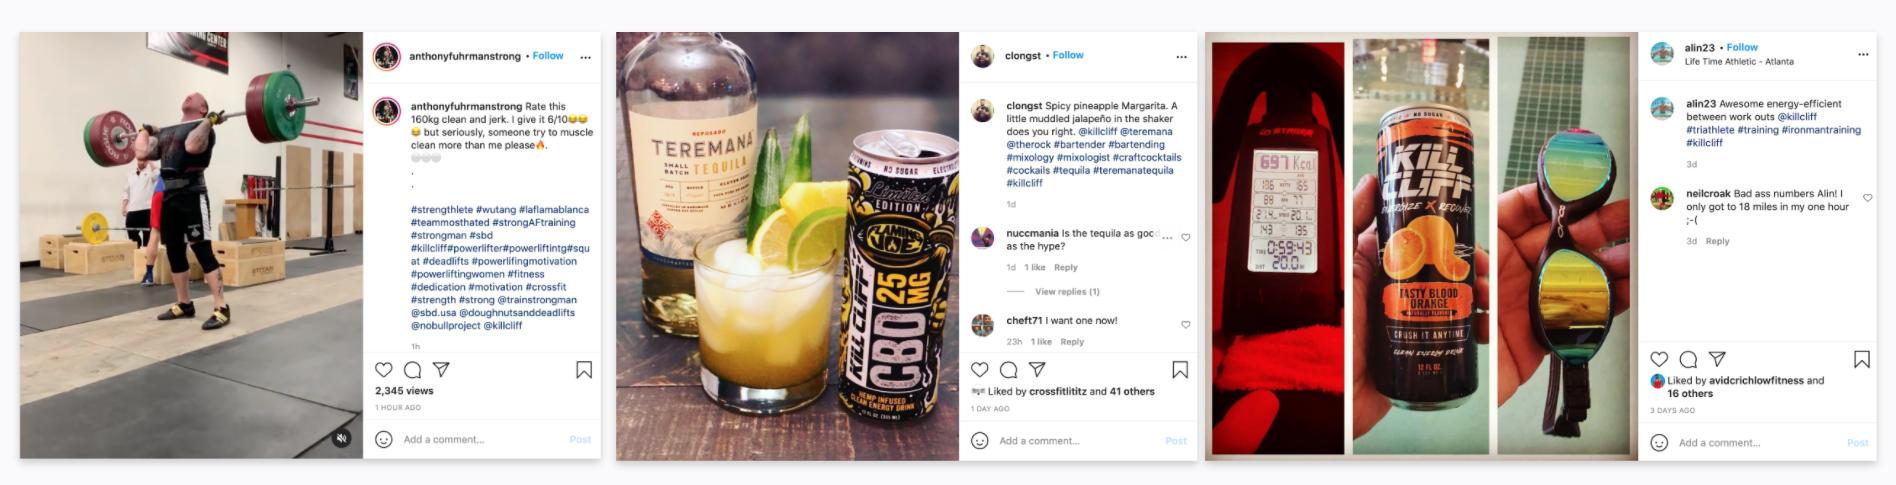 Kill Cliff - Instagram - Branded Hashtags